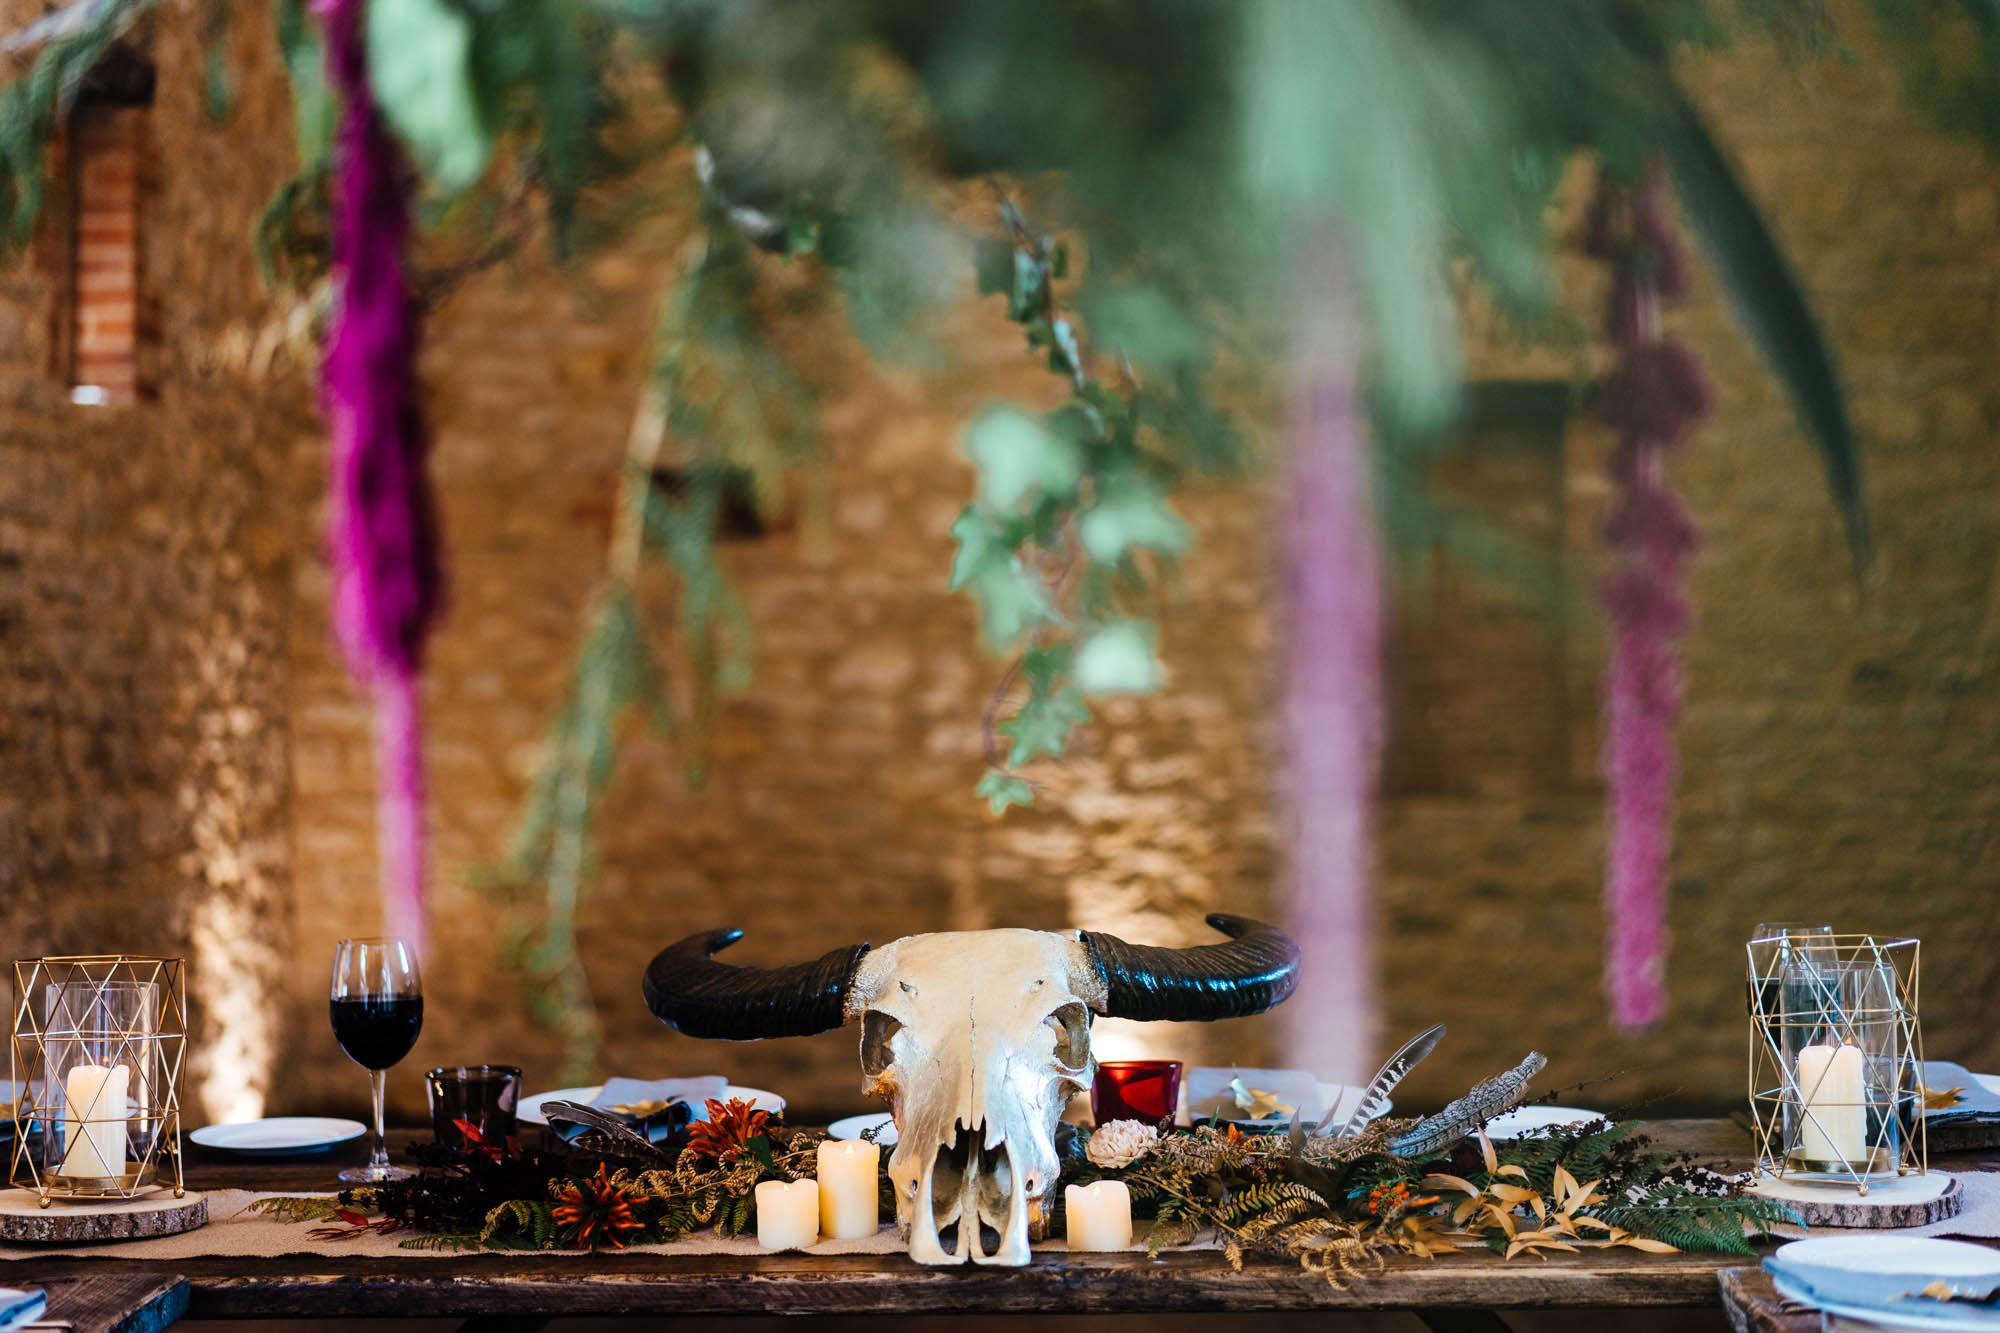 huntsmill-farm-wedding-inspiration-5